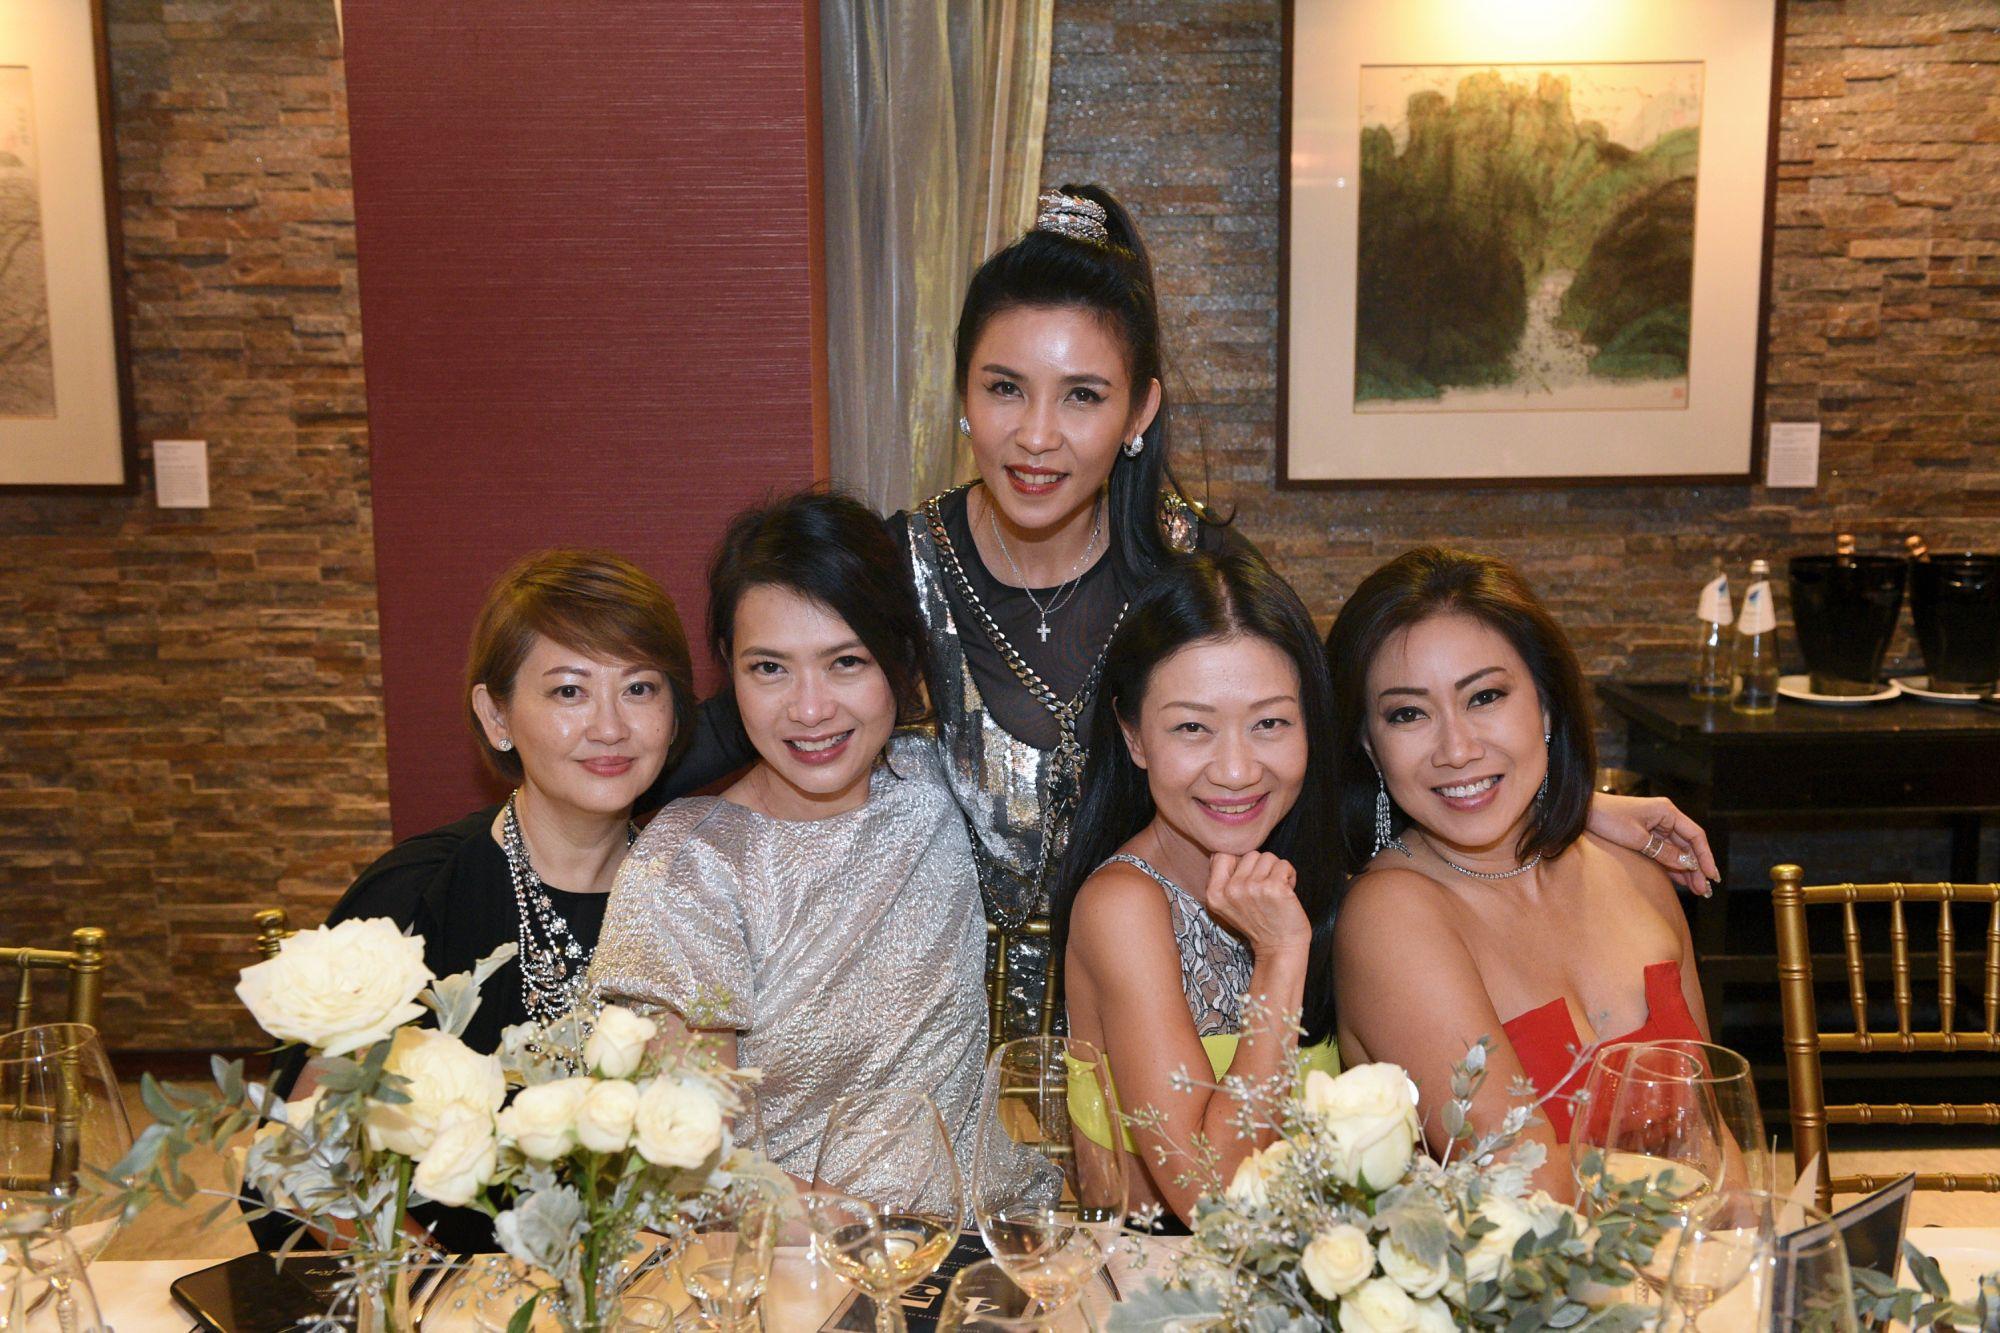 Jenny Wong, Ho Ching Lin, Fanty Soenardy, Dana Cheong, Ingrid Prasatya